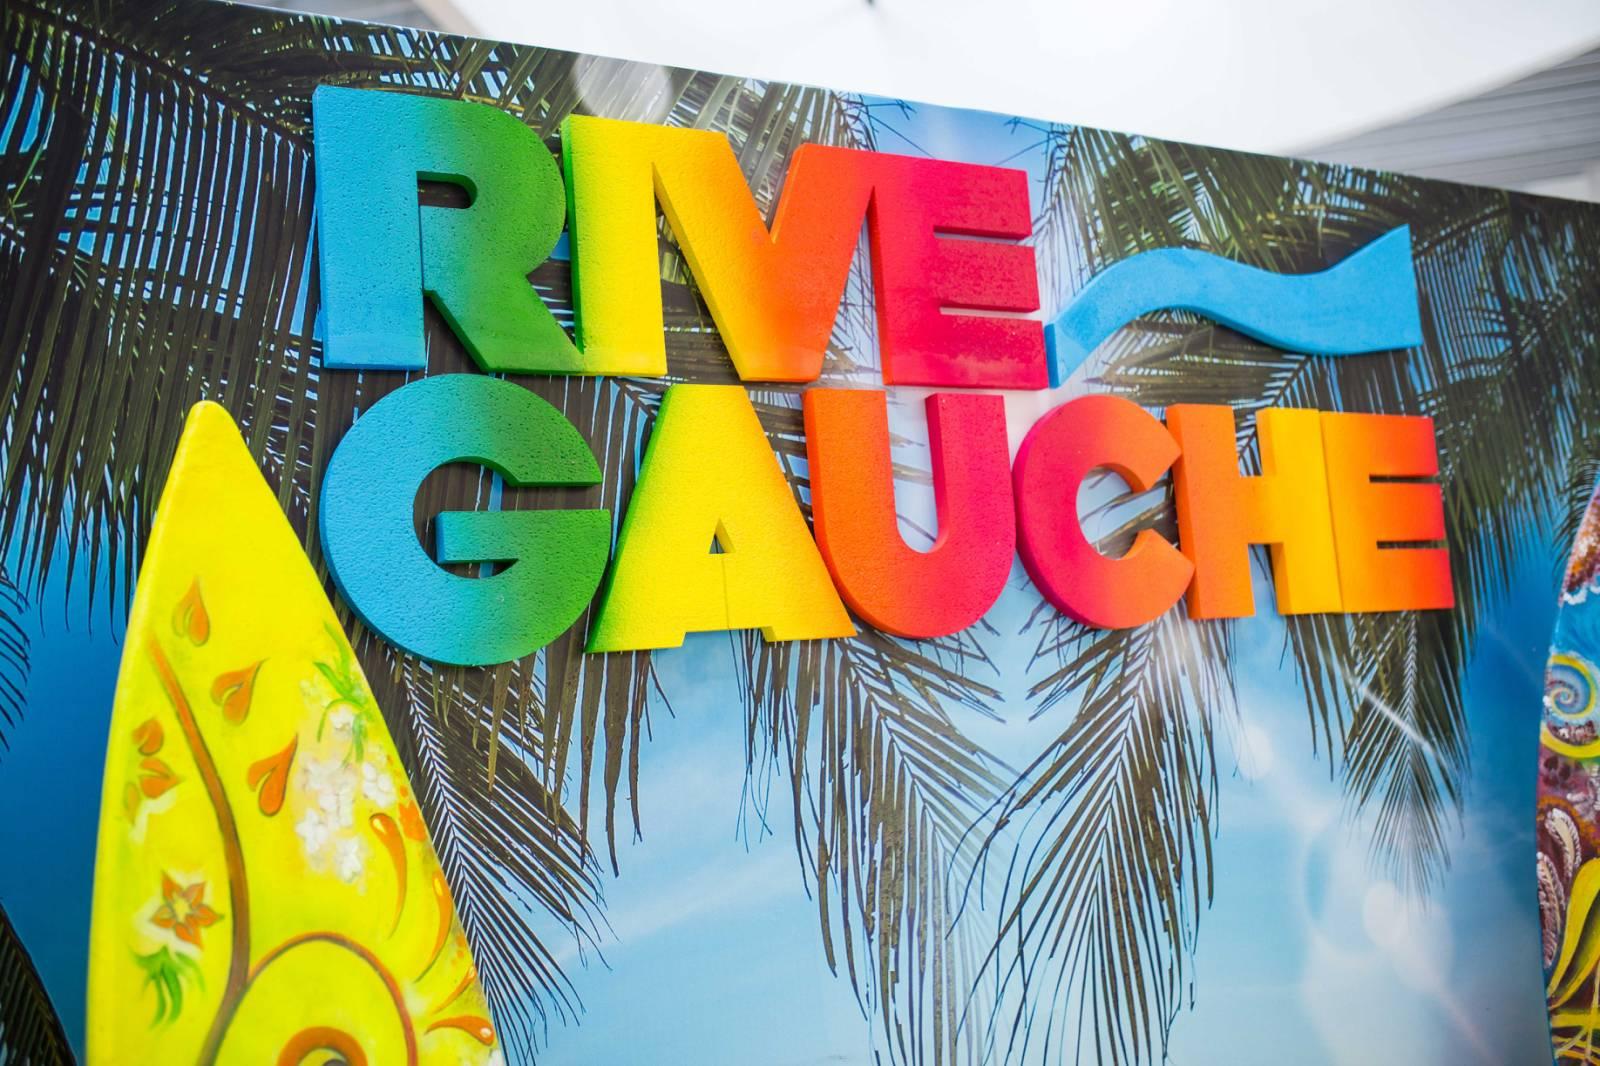 Rive Gauche Opening